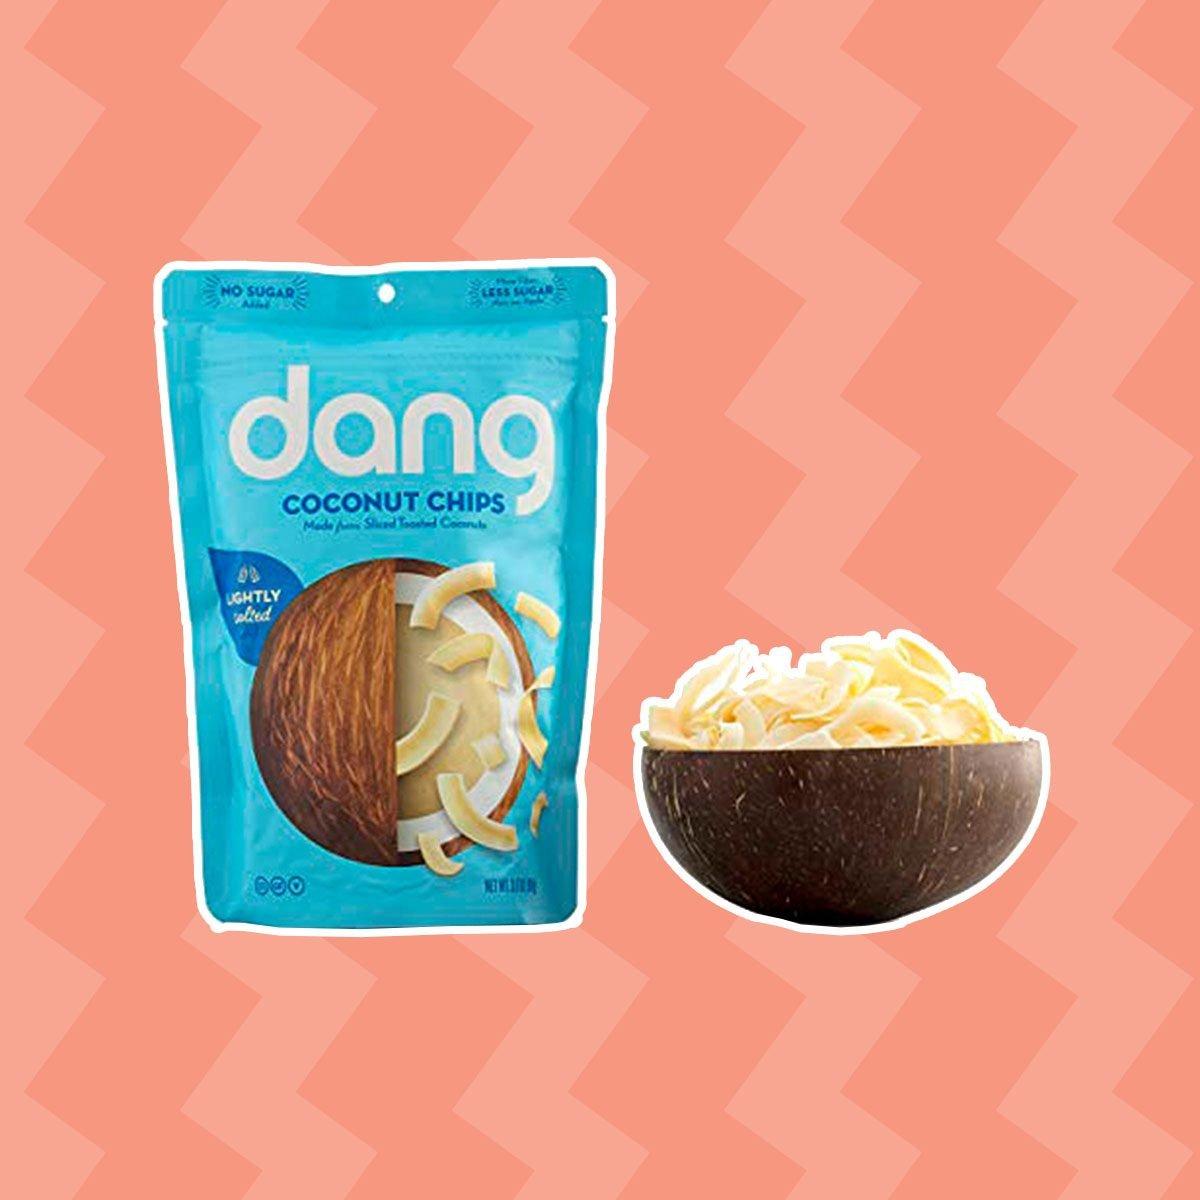 13 Best Keto-Friendly Snacks You Can Buy on Amazon